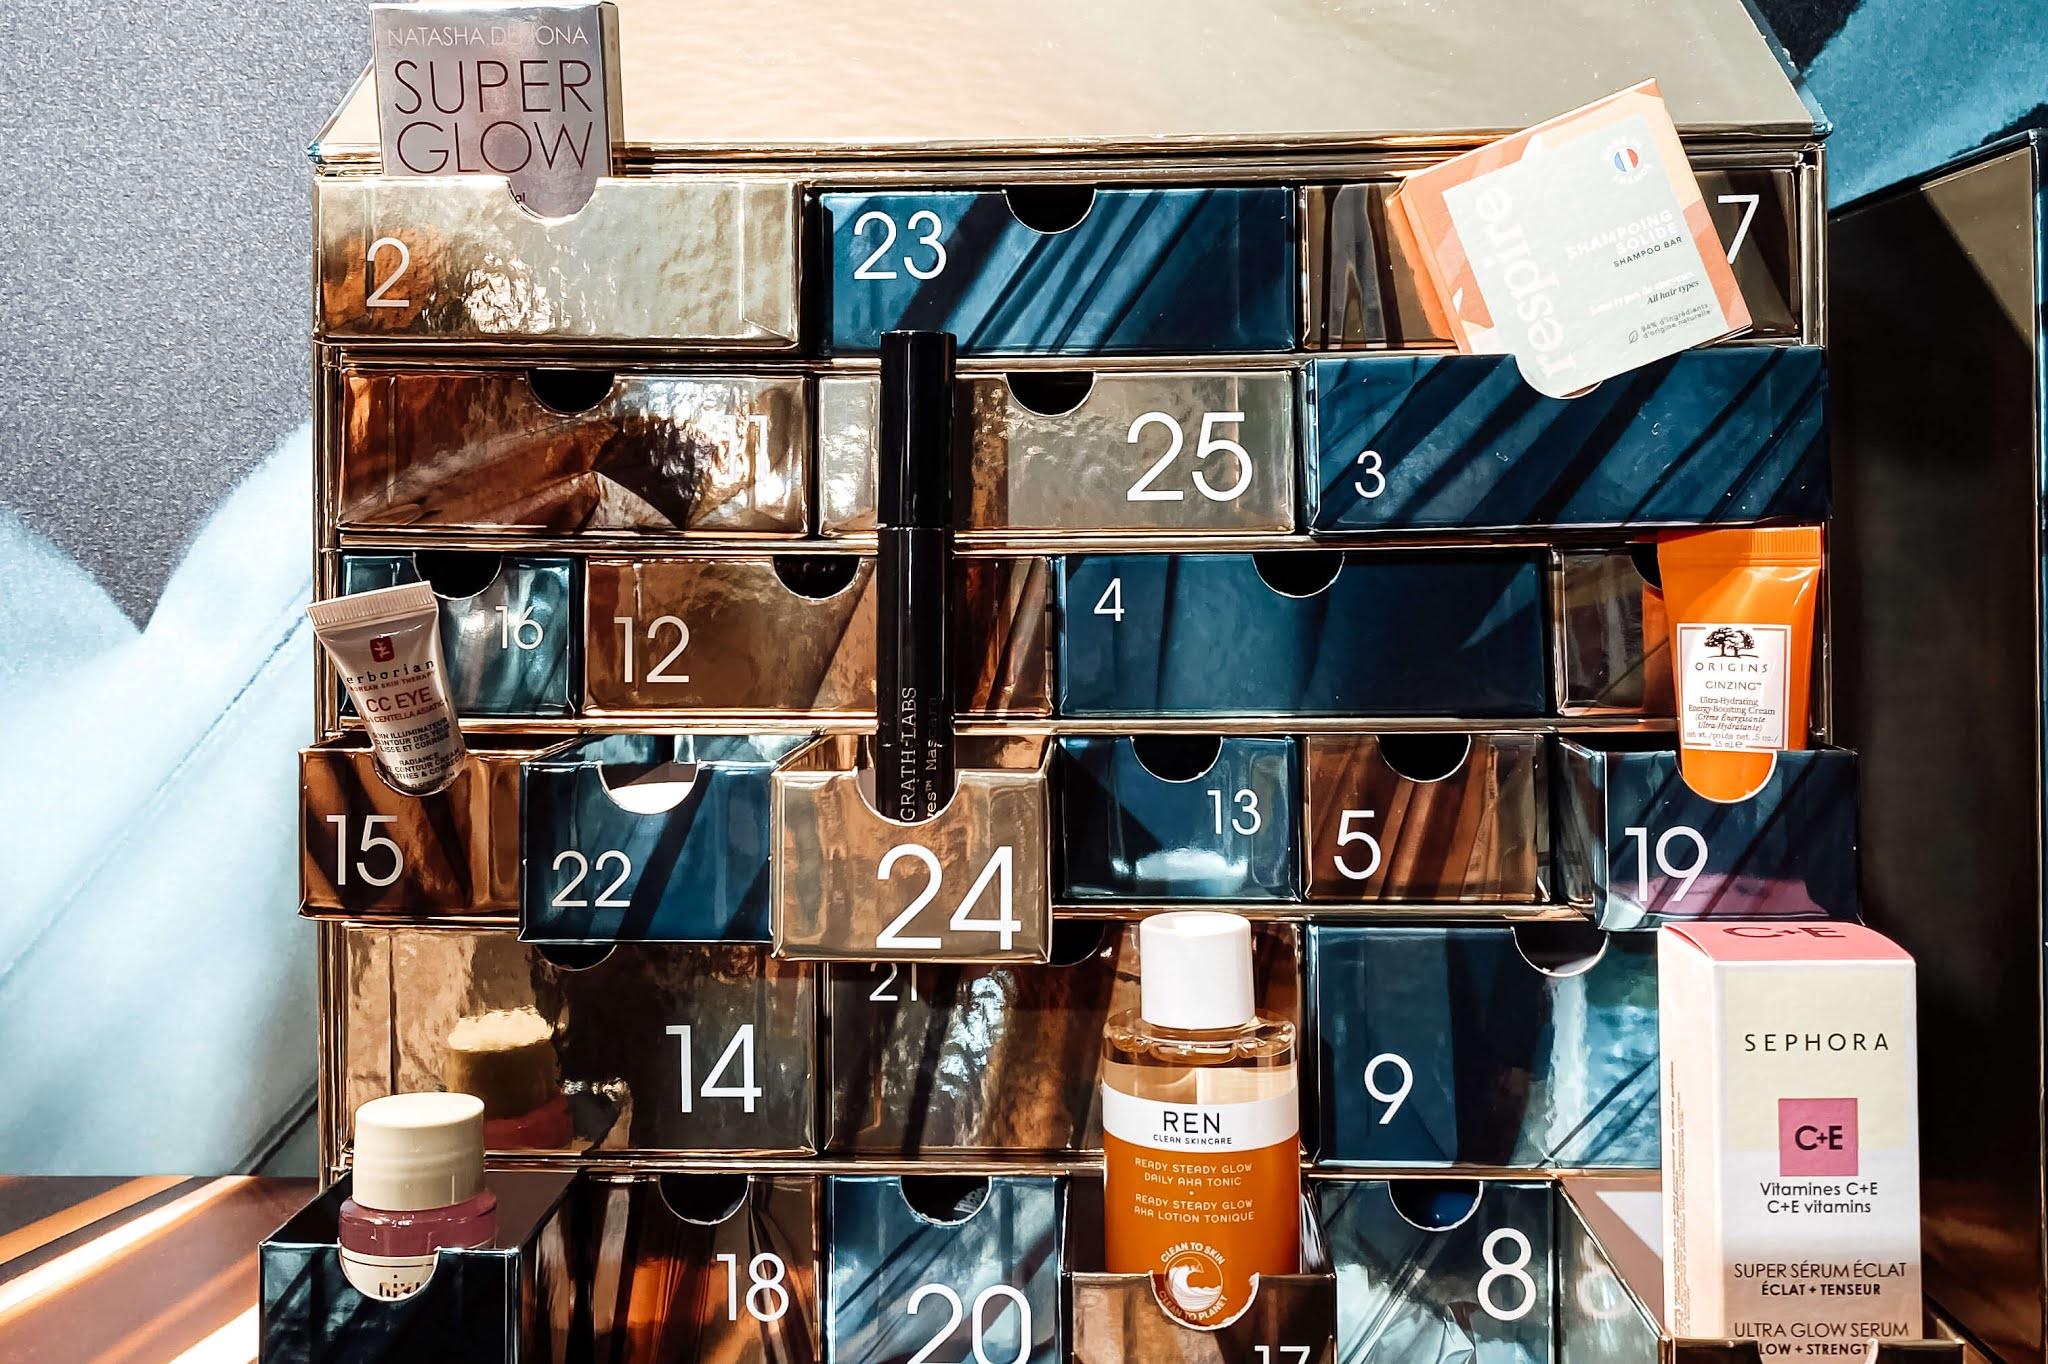 Sephora Favorites Calendrier de l'Avent 2020